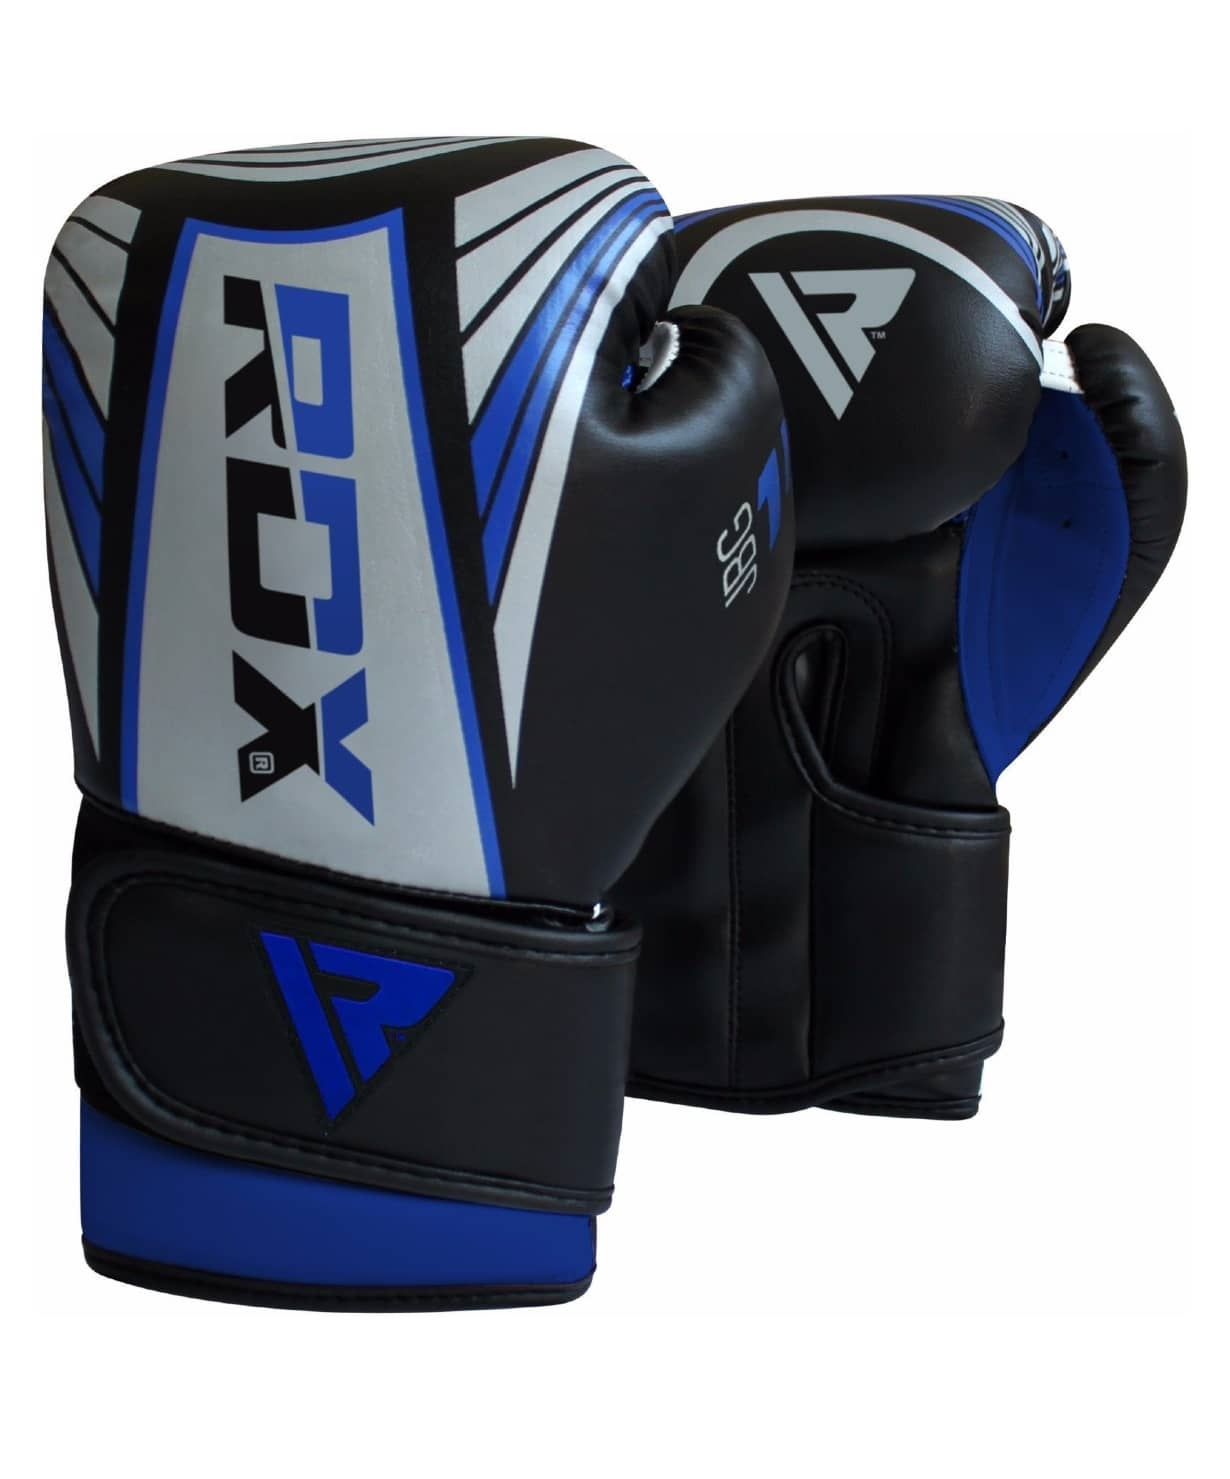 Перчатки боксерские KIDS JBG-1U SILVER/BLUE JBG-1U-6oz, 6 oz